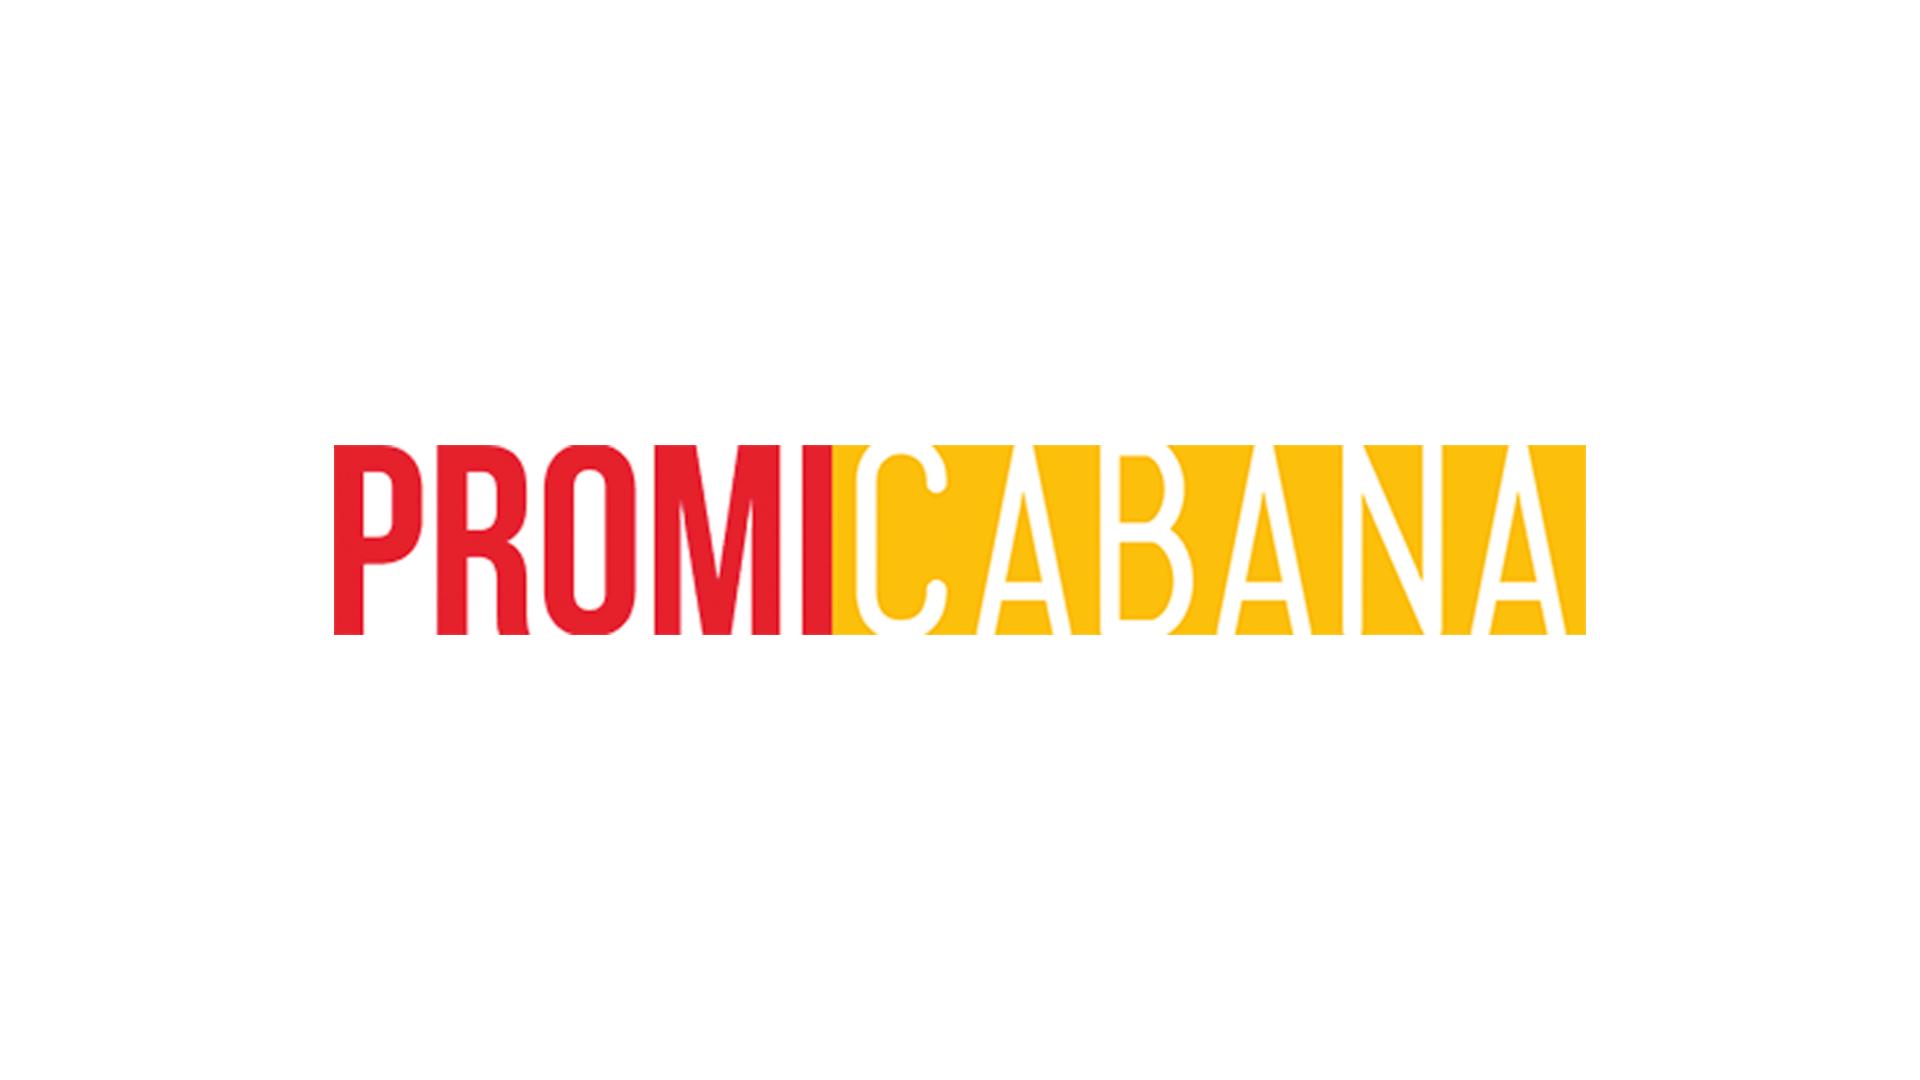 Rick-Tara-The-Walking-Dead